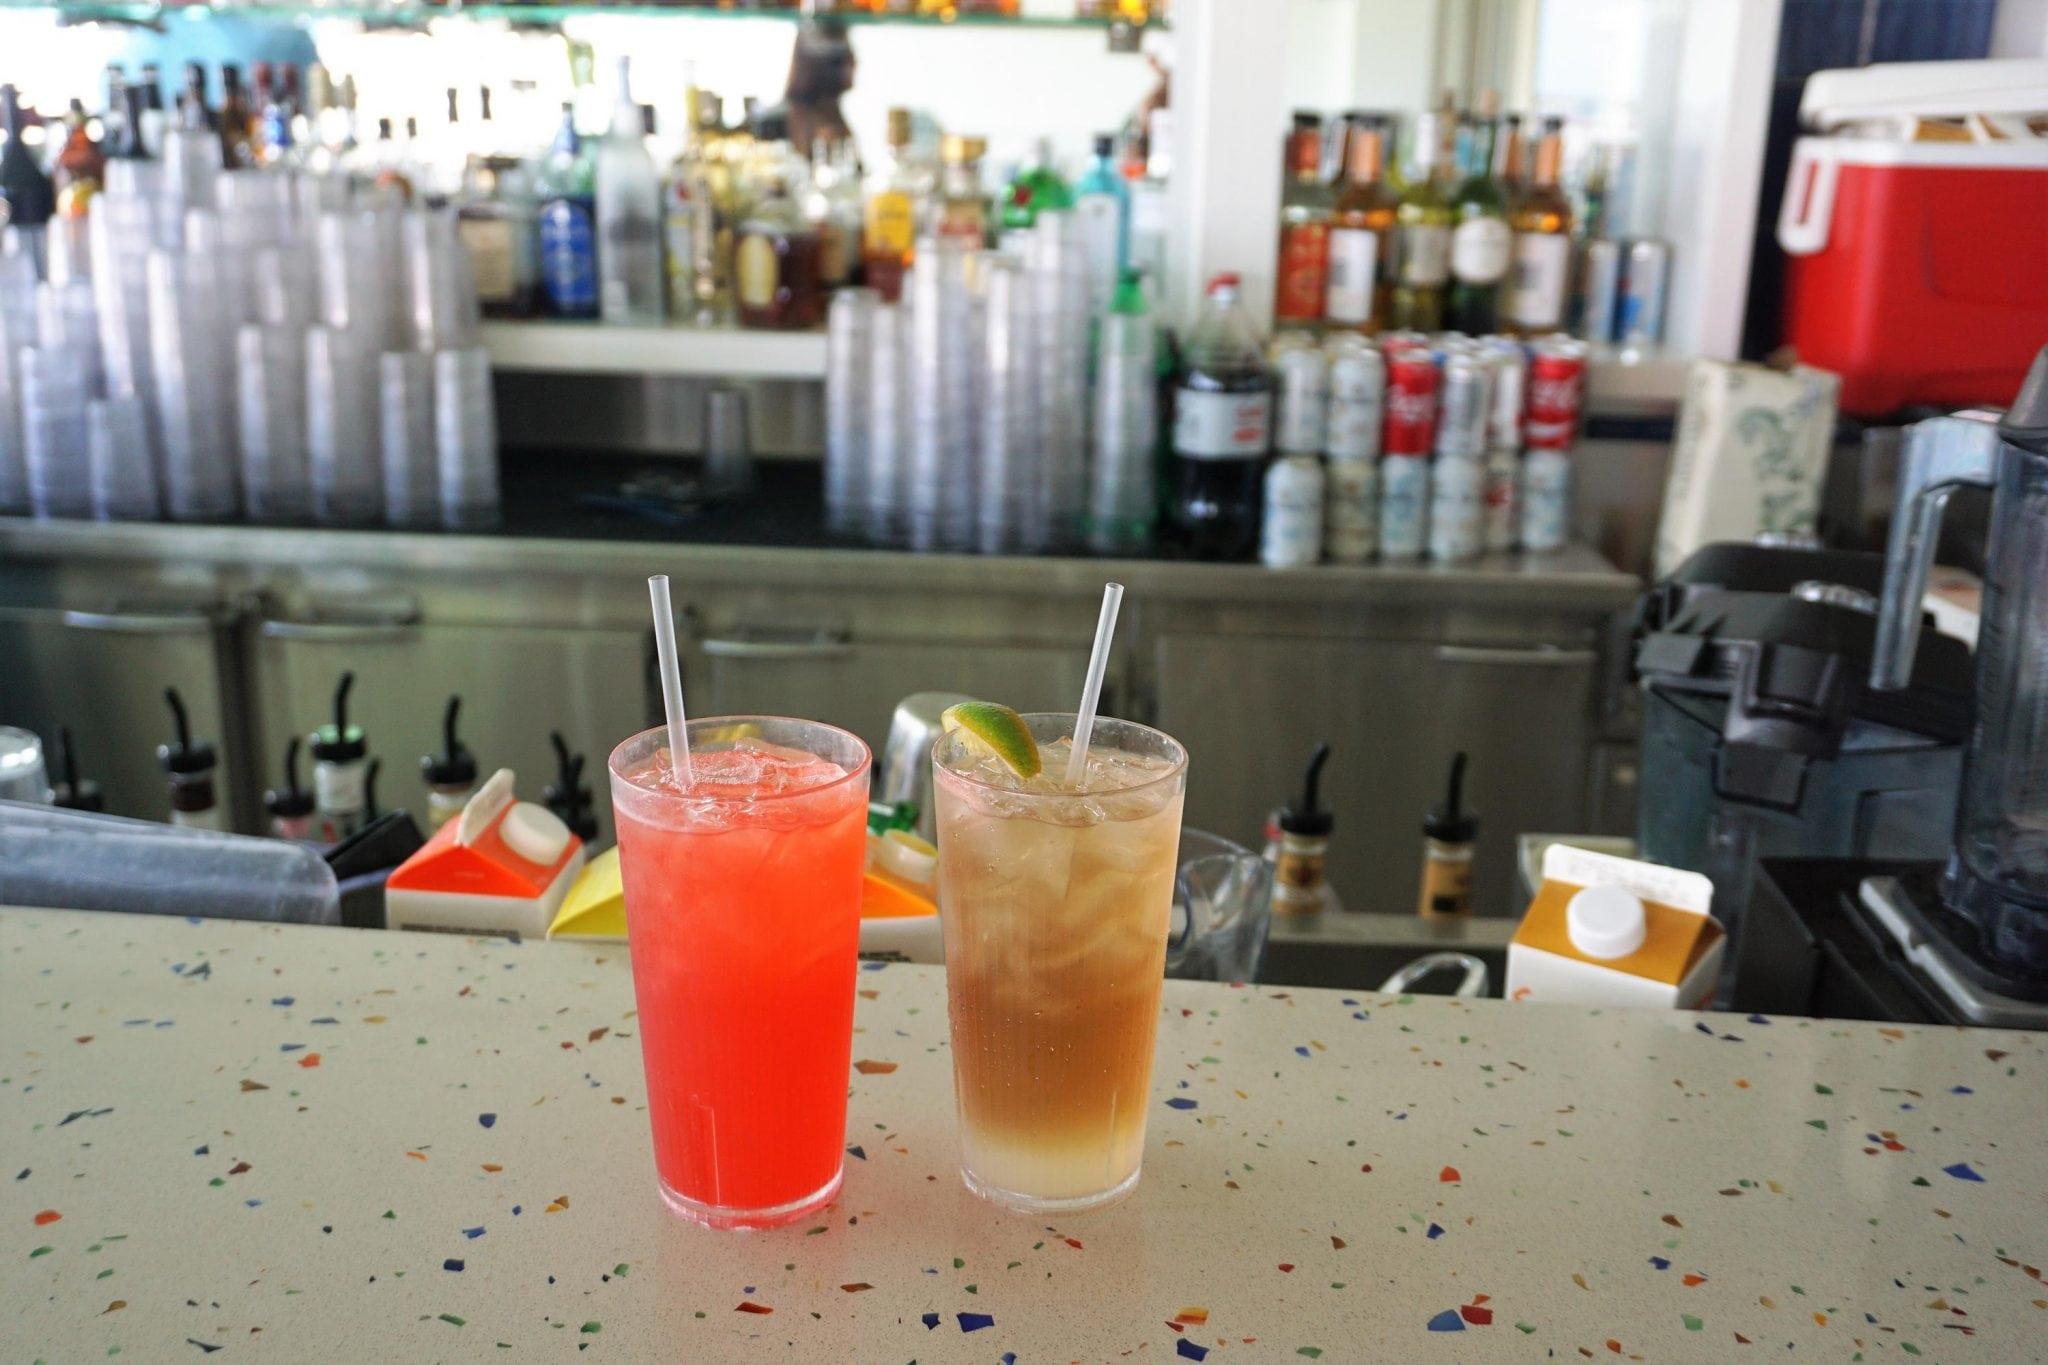 Sky Bar Drinks Majsty of the Seas